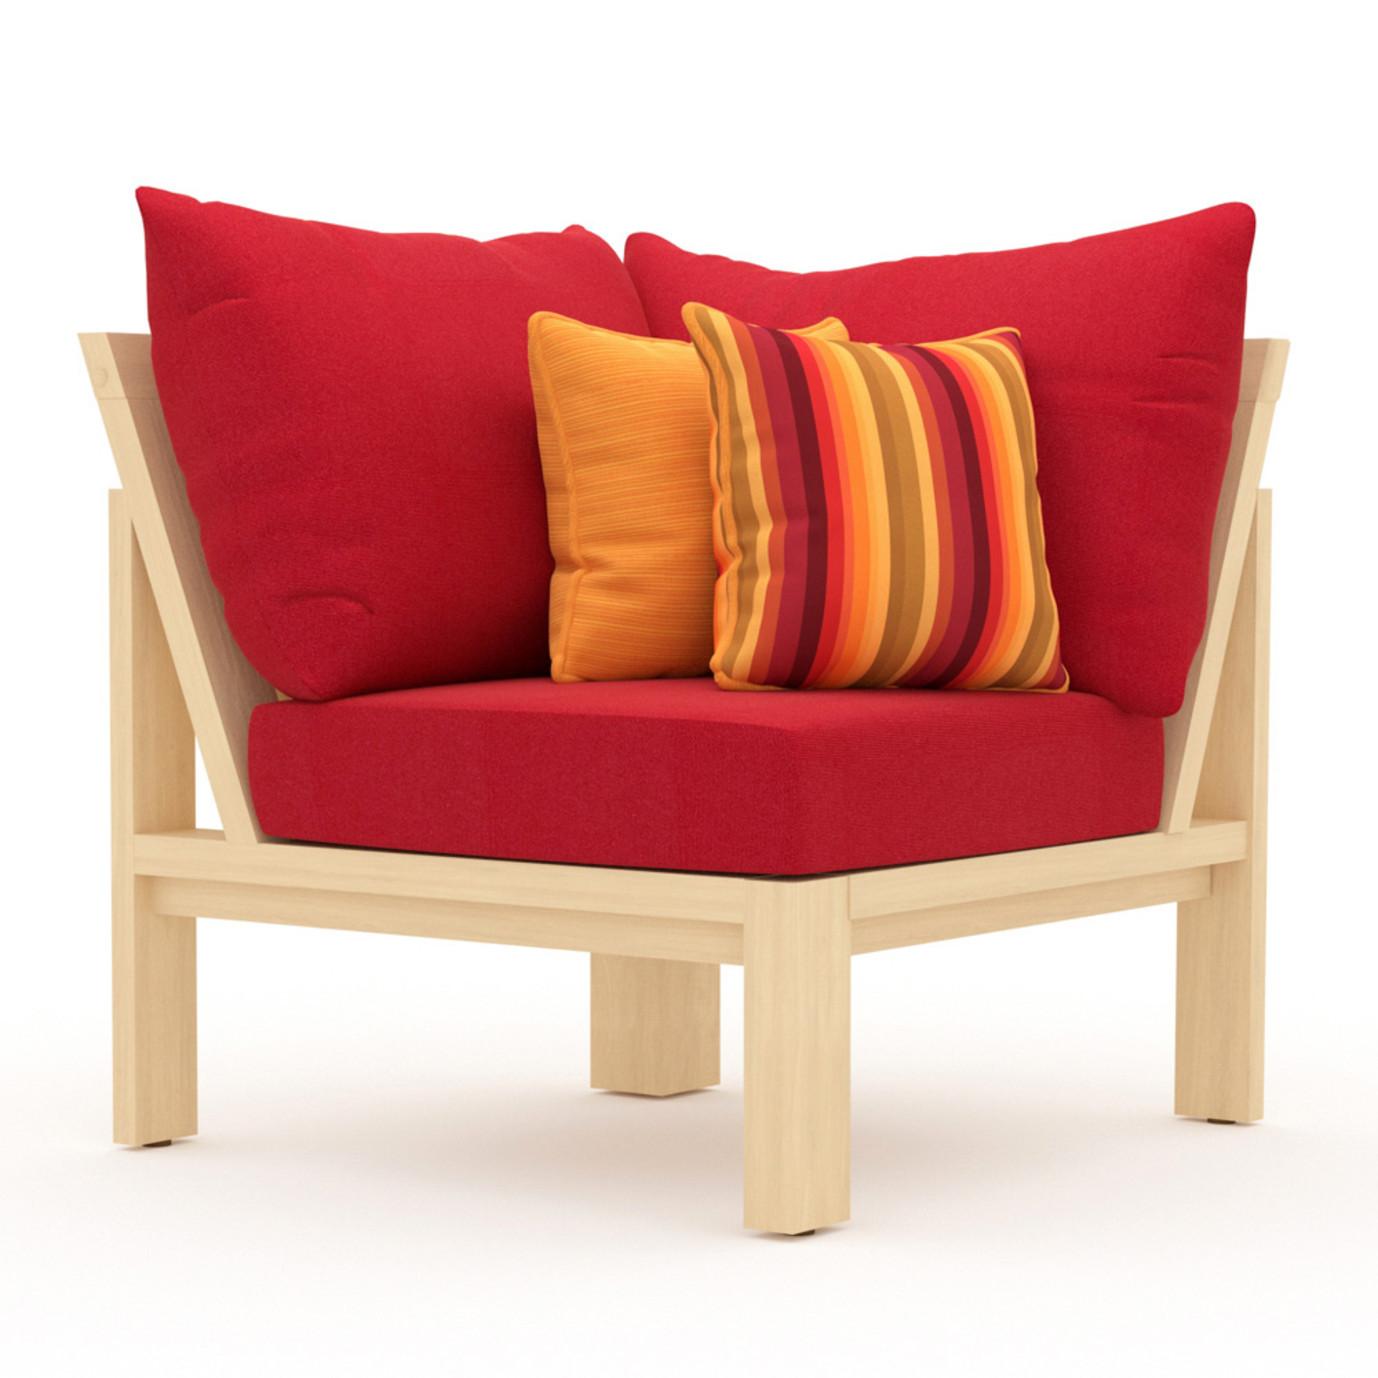 Benson™ Corner Chair - Sunset Red